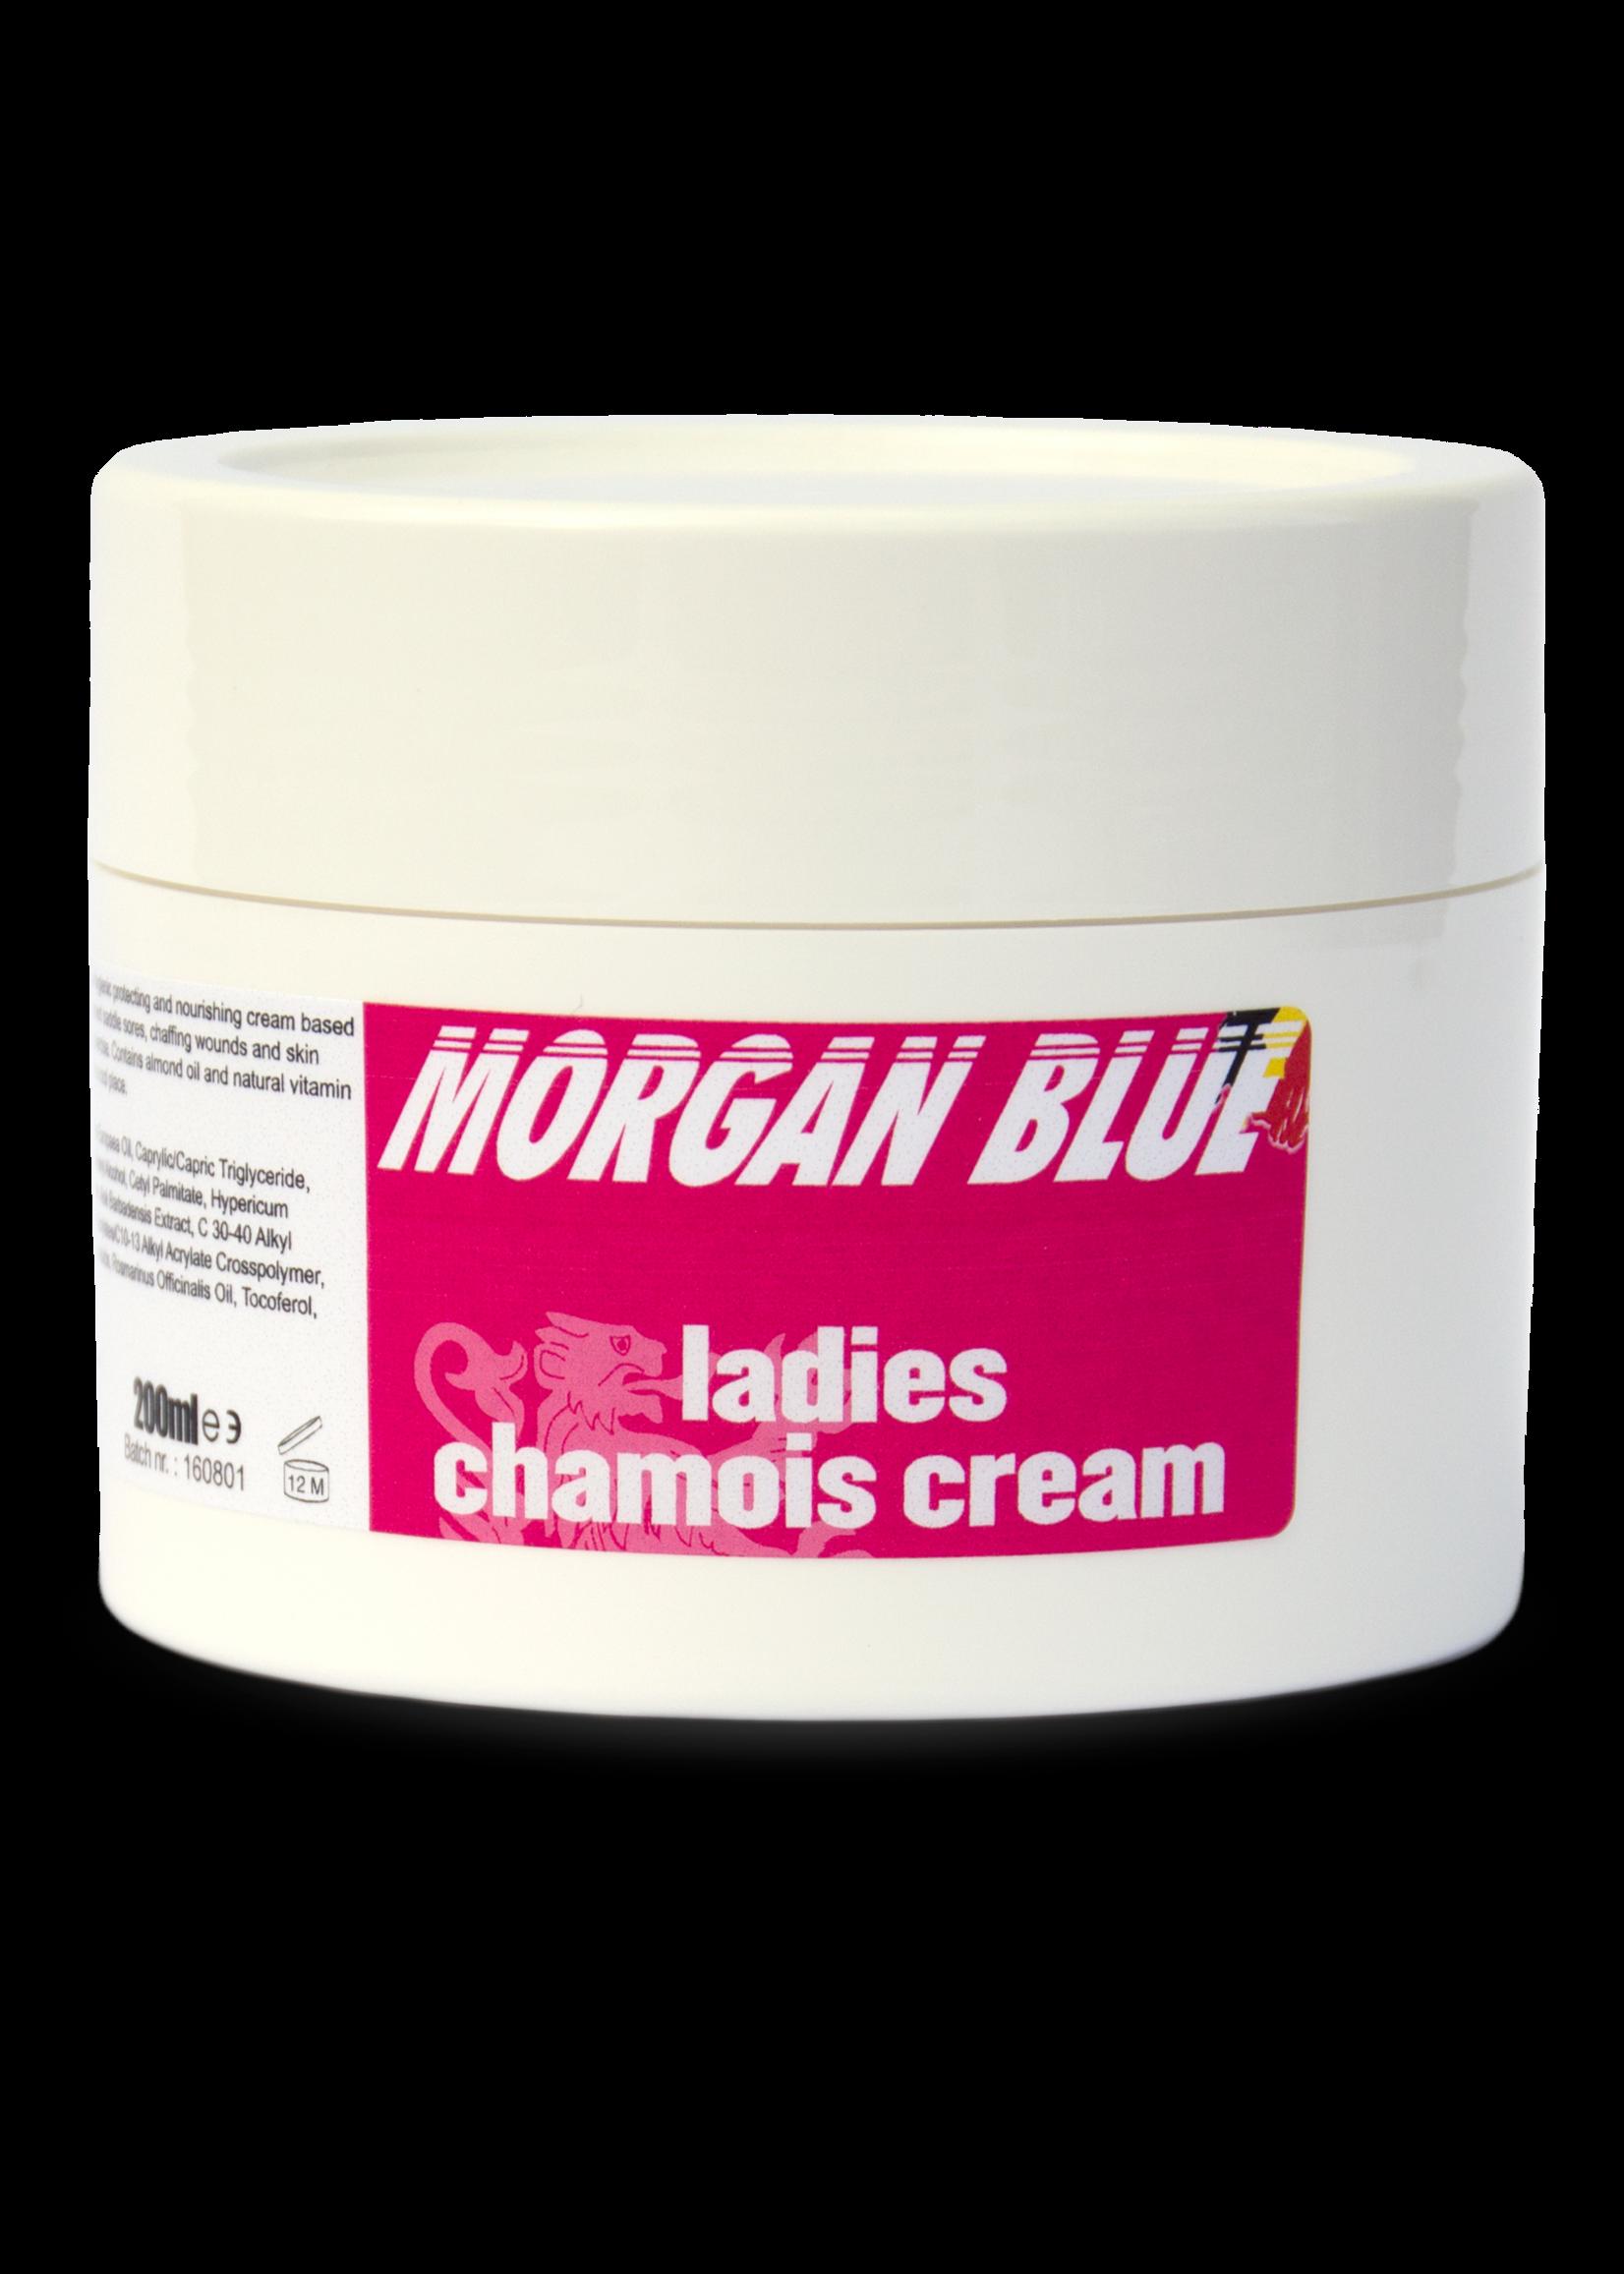 Morgan Blue Ladies Chamois Cream